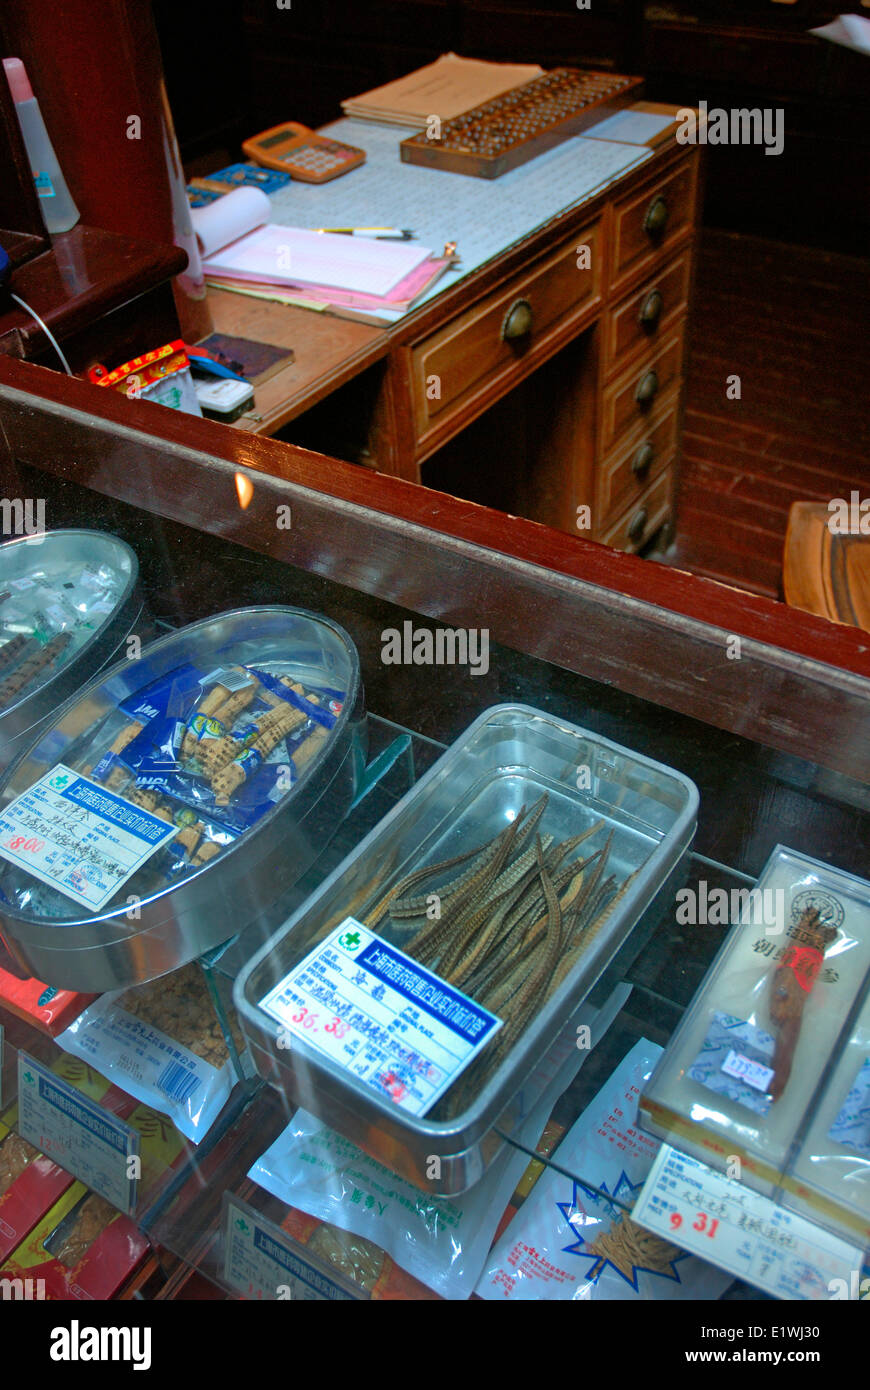 Traditional drugstore in Zhouzhuang near Shanghai, China. September 2007 - Stock Image